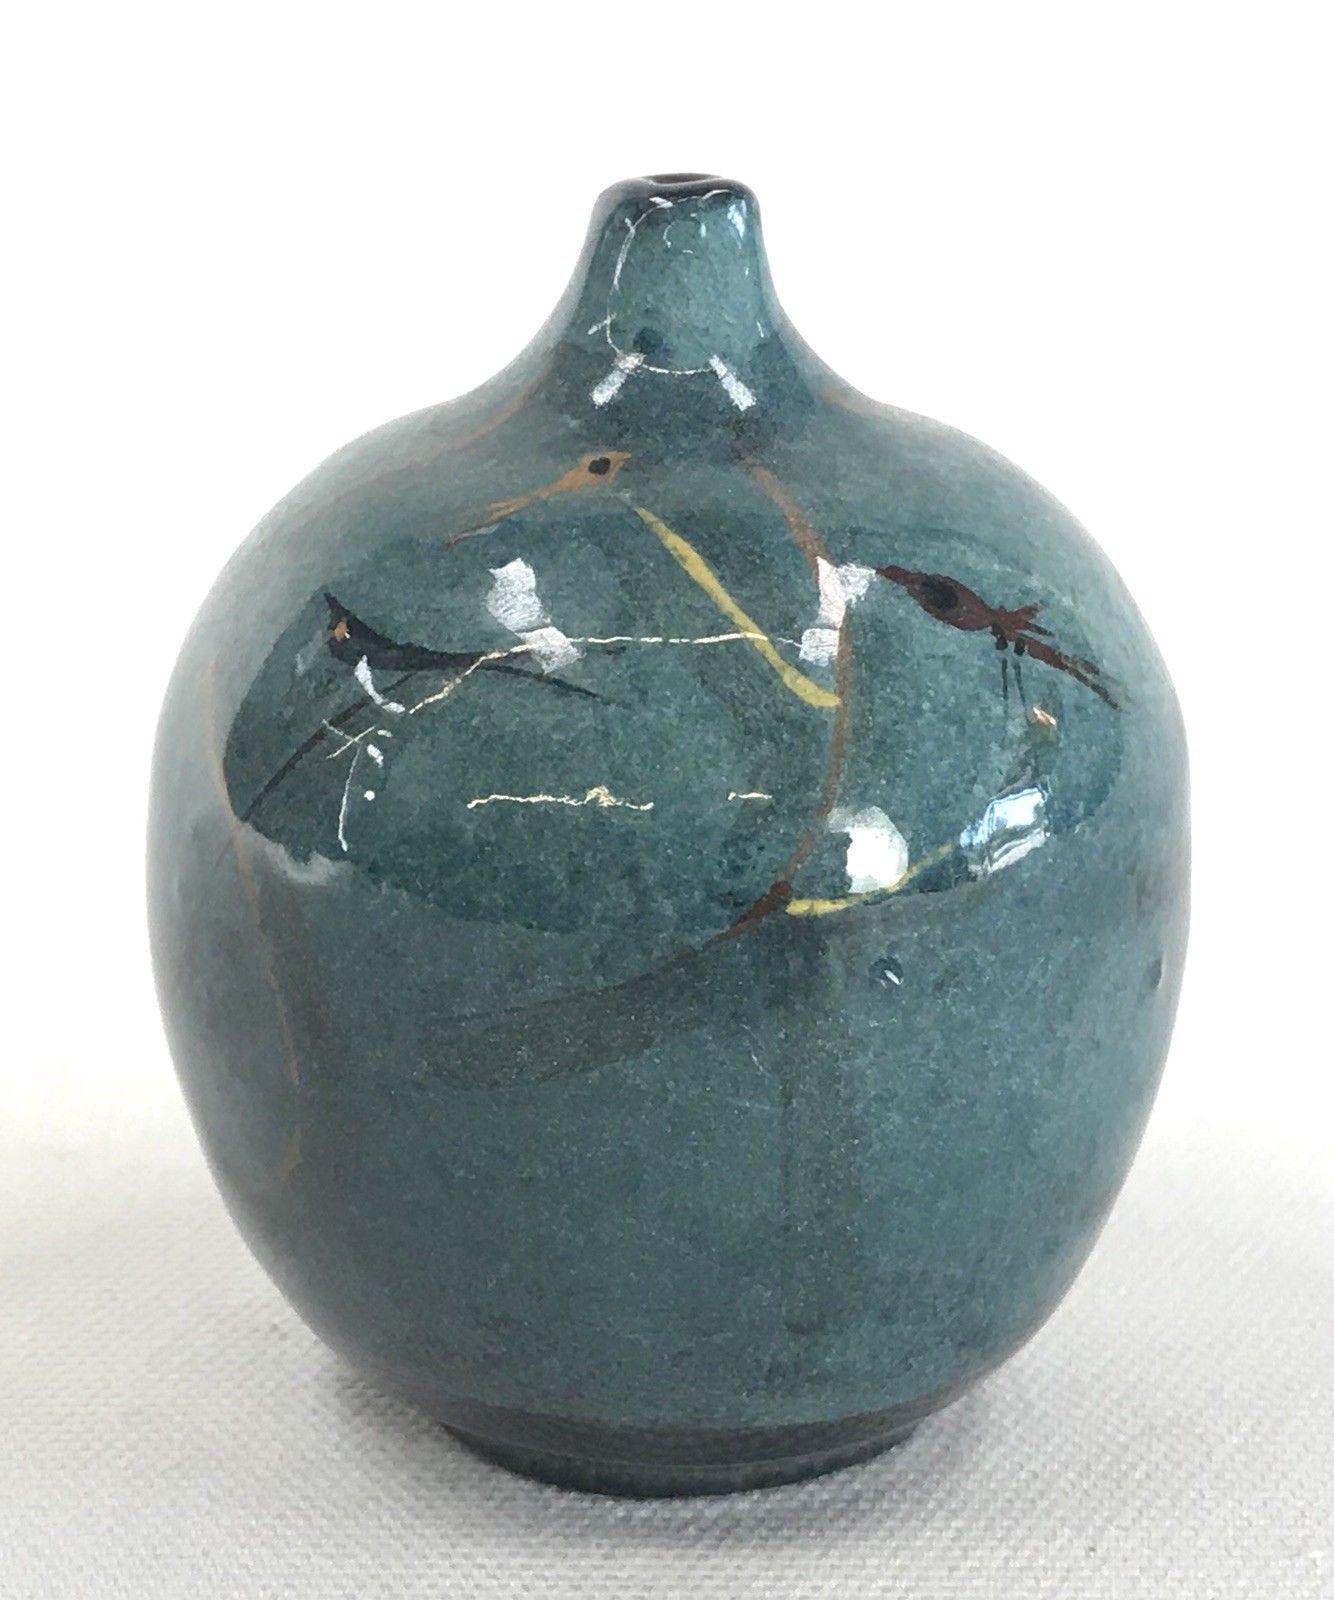 VTG MCM Polia Pillin Art Pottery Teal Mini Bud Cabinet Vase